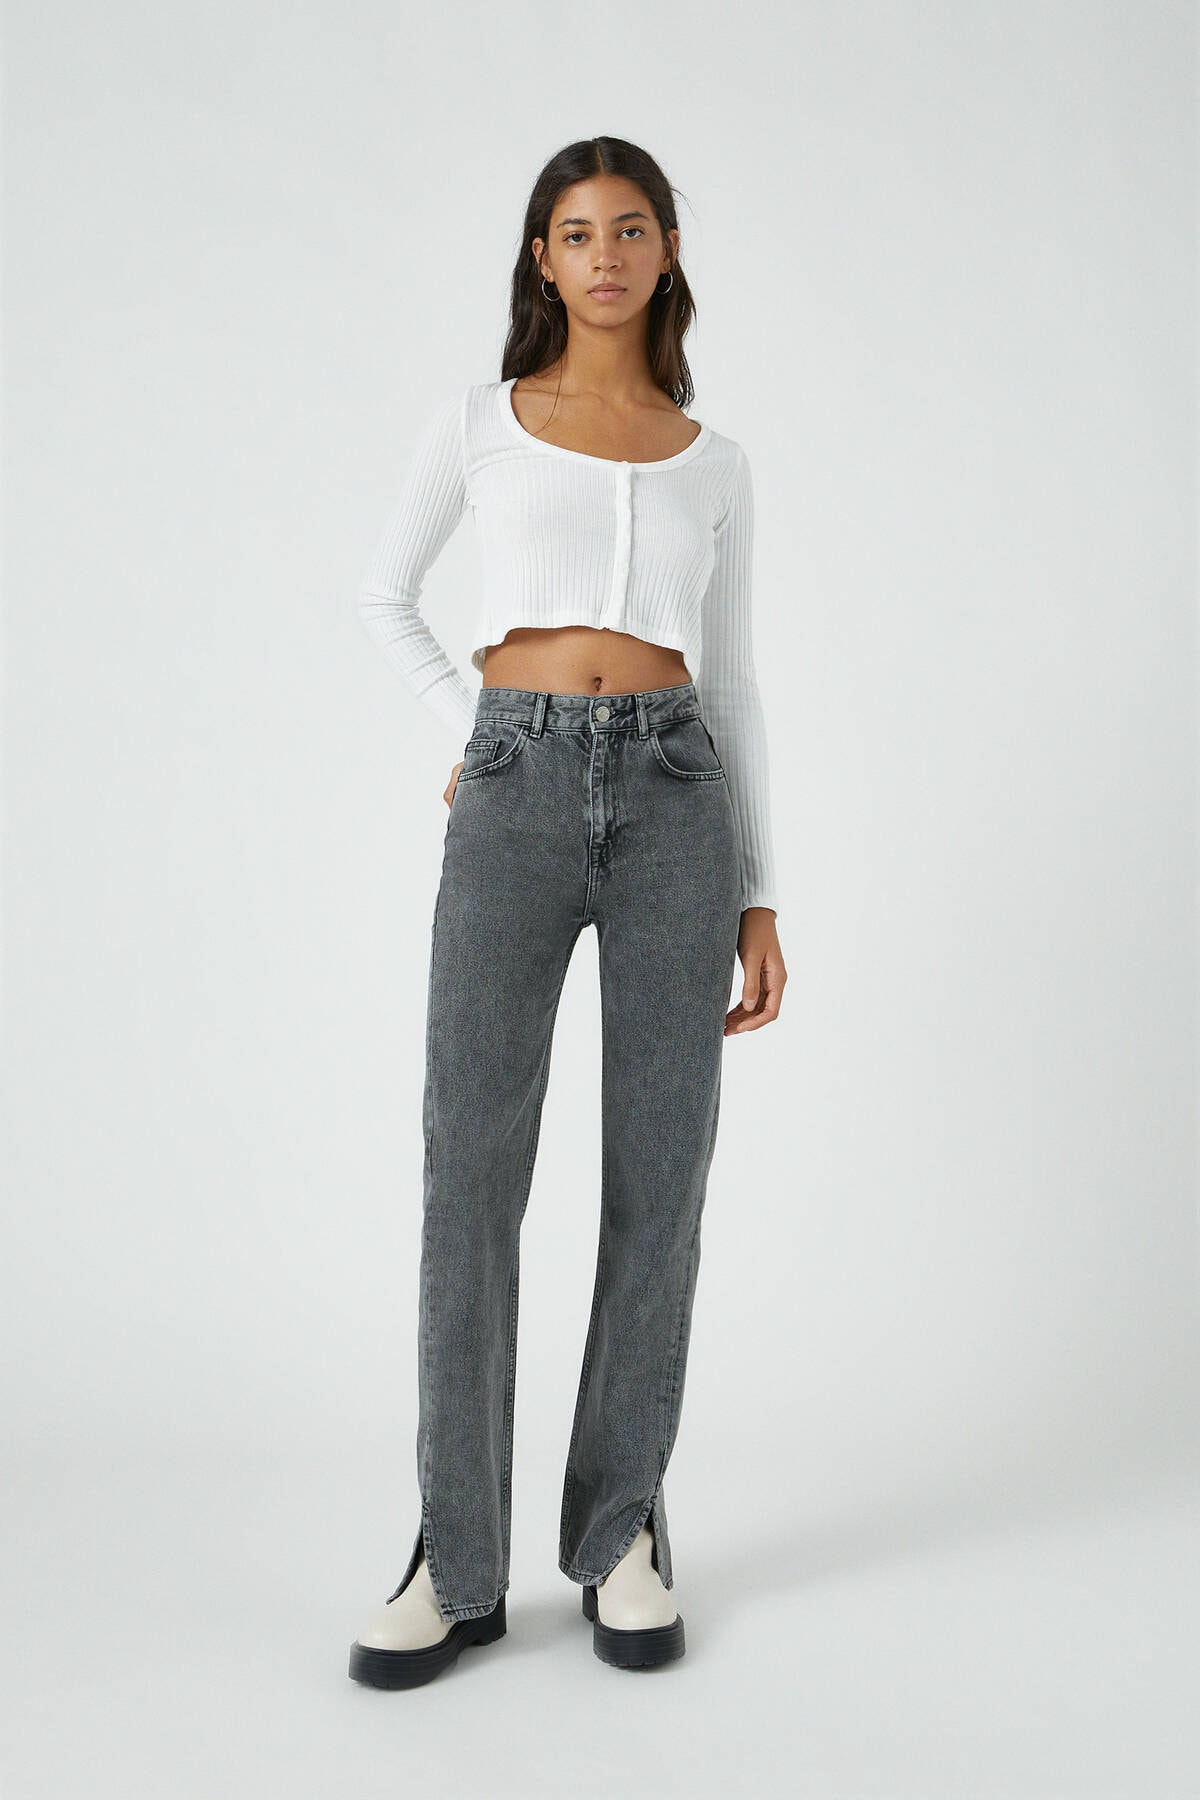 Pull & Bear Kadın Gri Yüksek Bel Straight Fit Jean 09683410